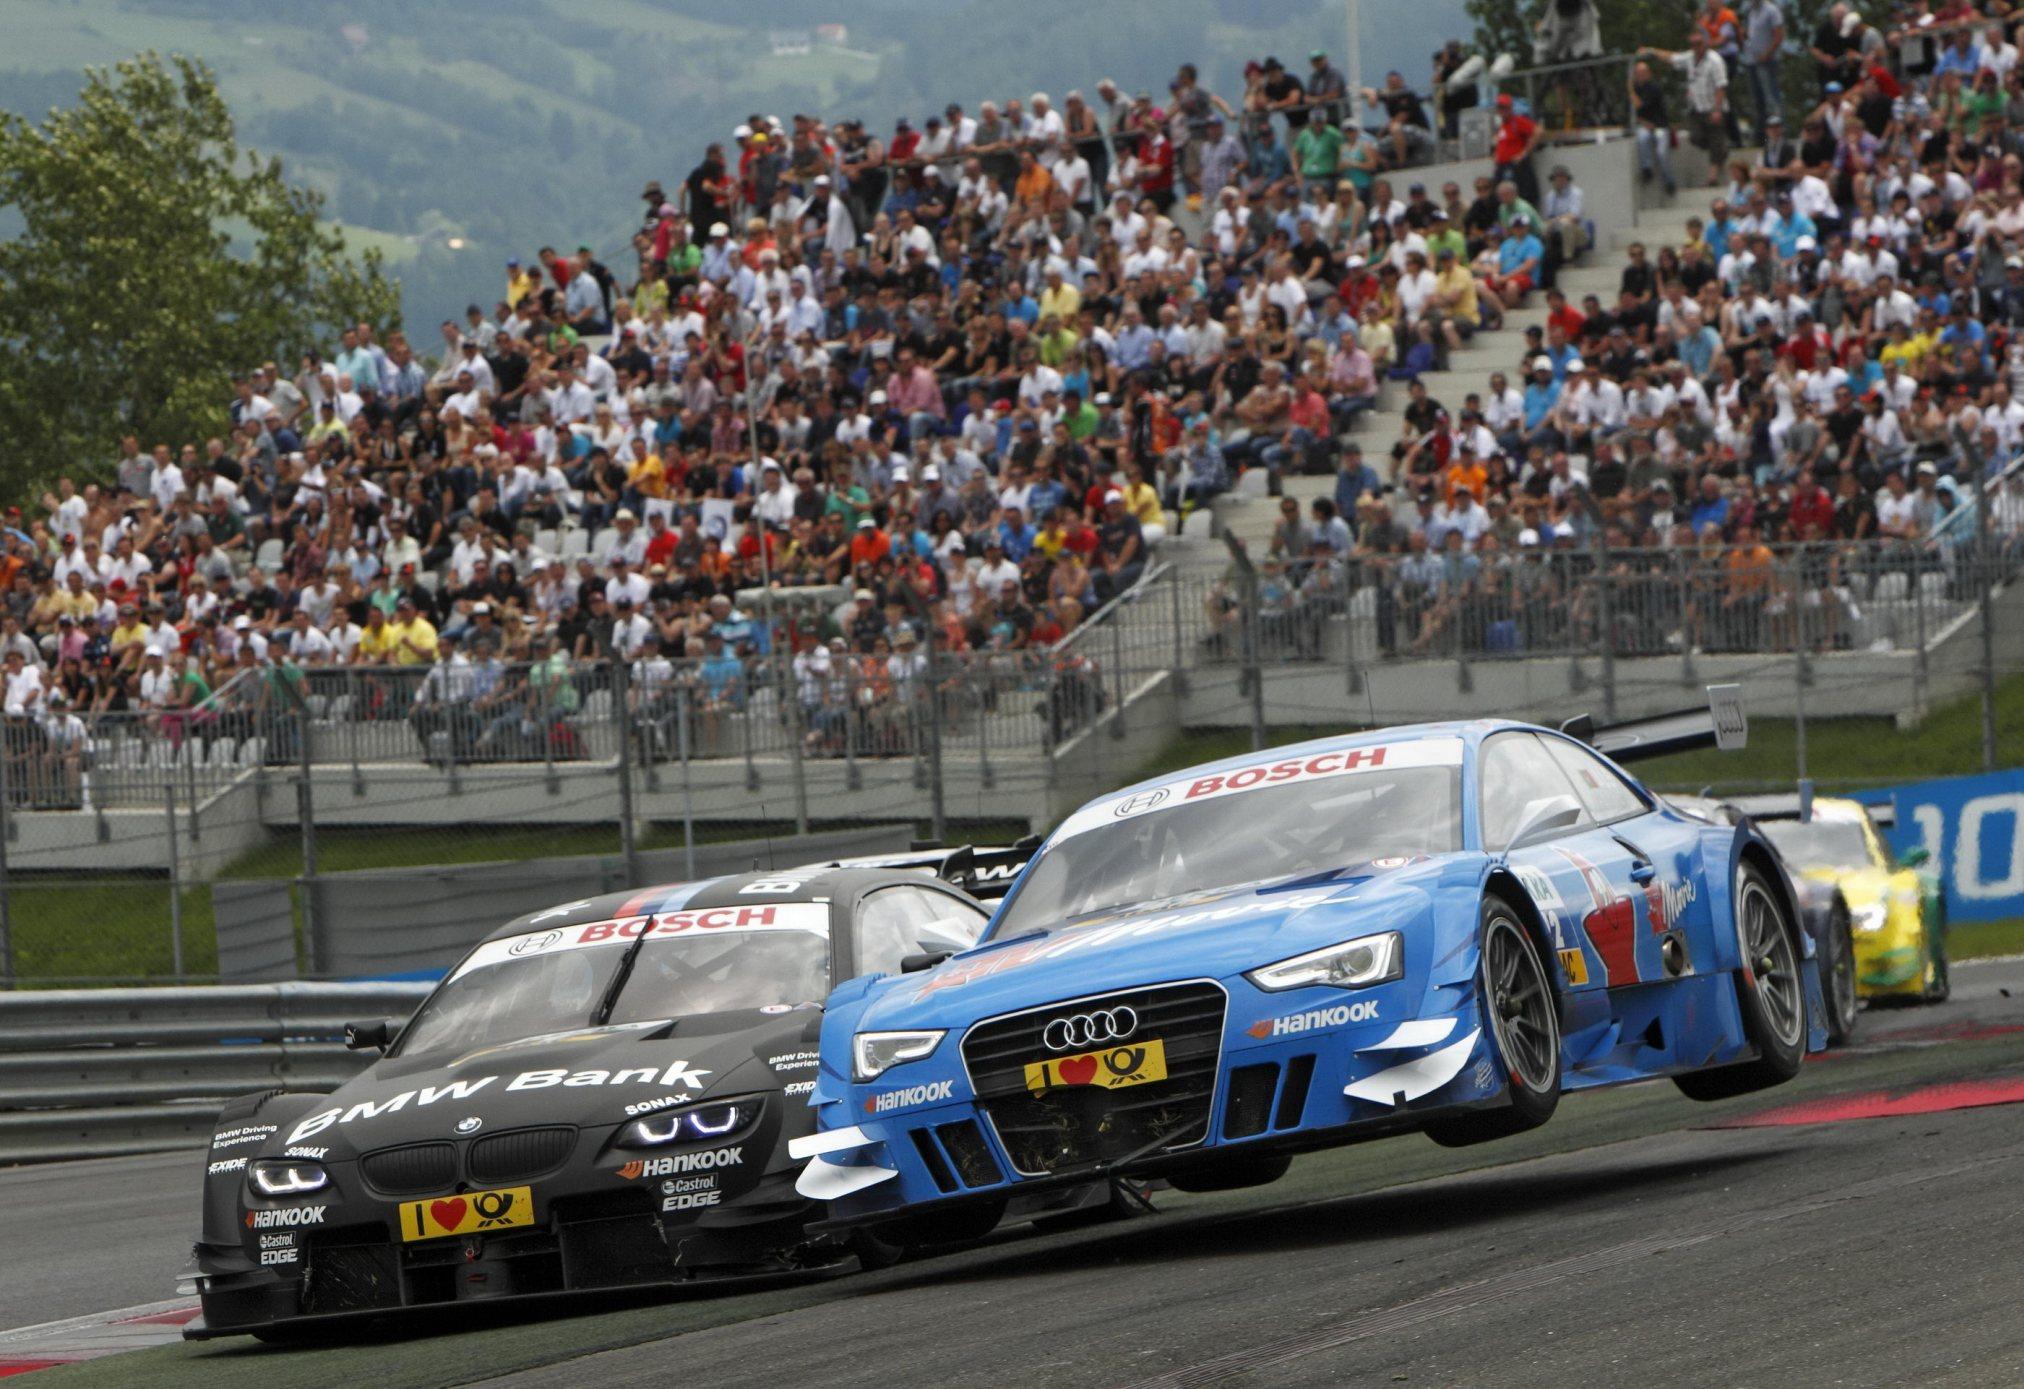 Dtm Vorbericht Norisring 2012 Racingblog